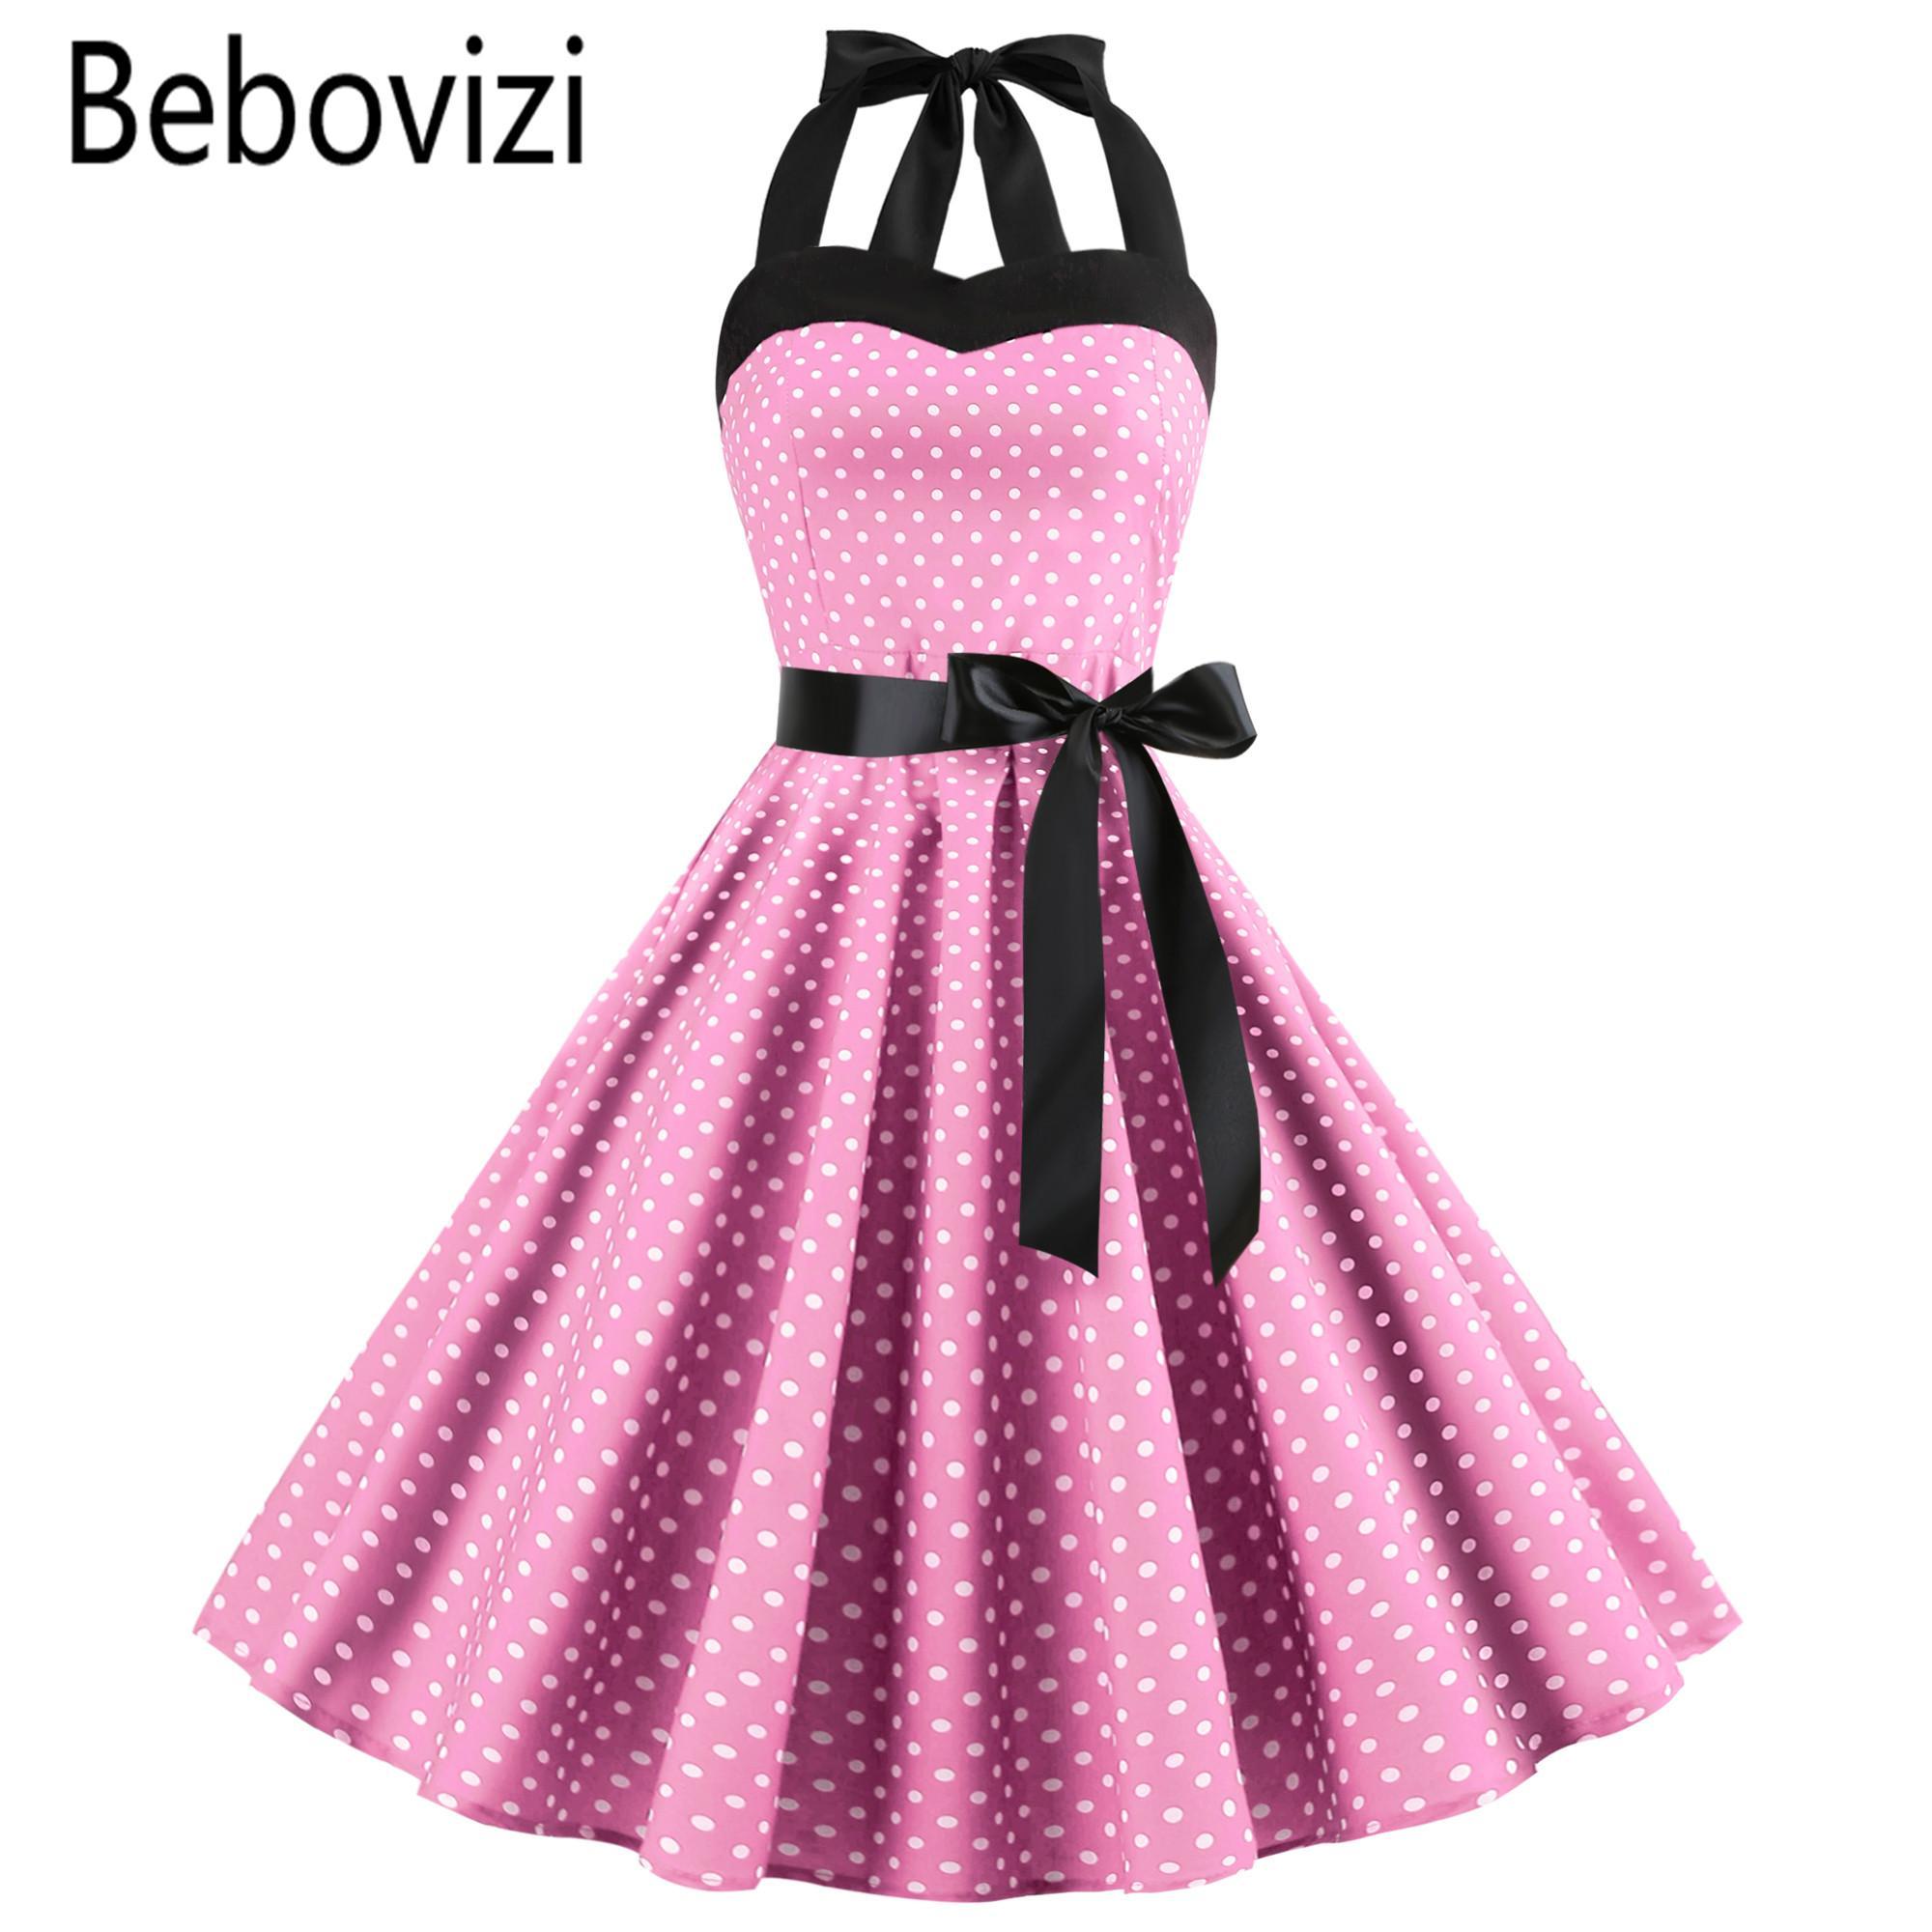 8e4a8ba25de51 Nouveau 2019 Rose Midi Robe Retro Polka Dot Hepburn Vintage Années 50  Années 60 Halter Party Dress Pin Up Rockabilly Robes Robe Robe Plus La  Taille